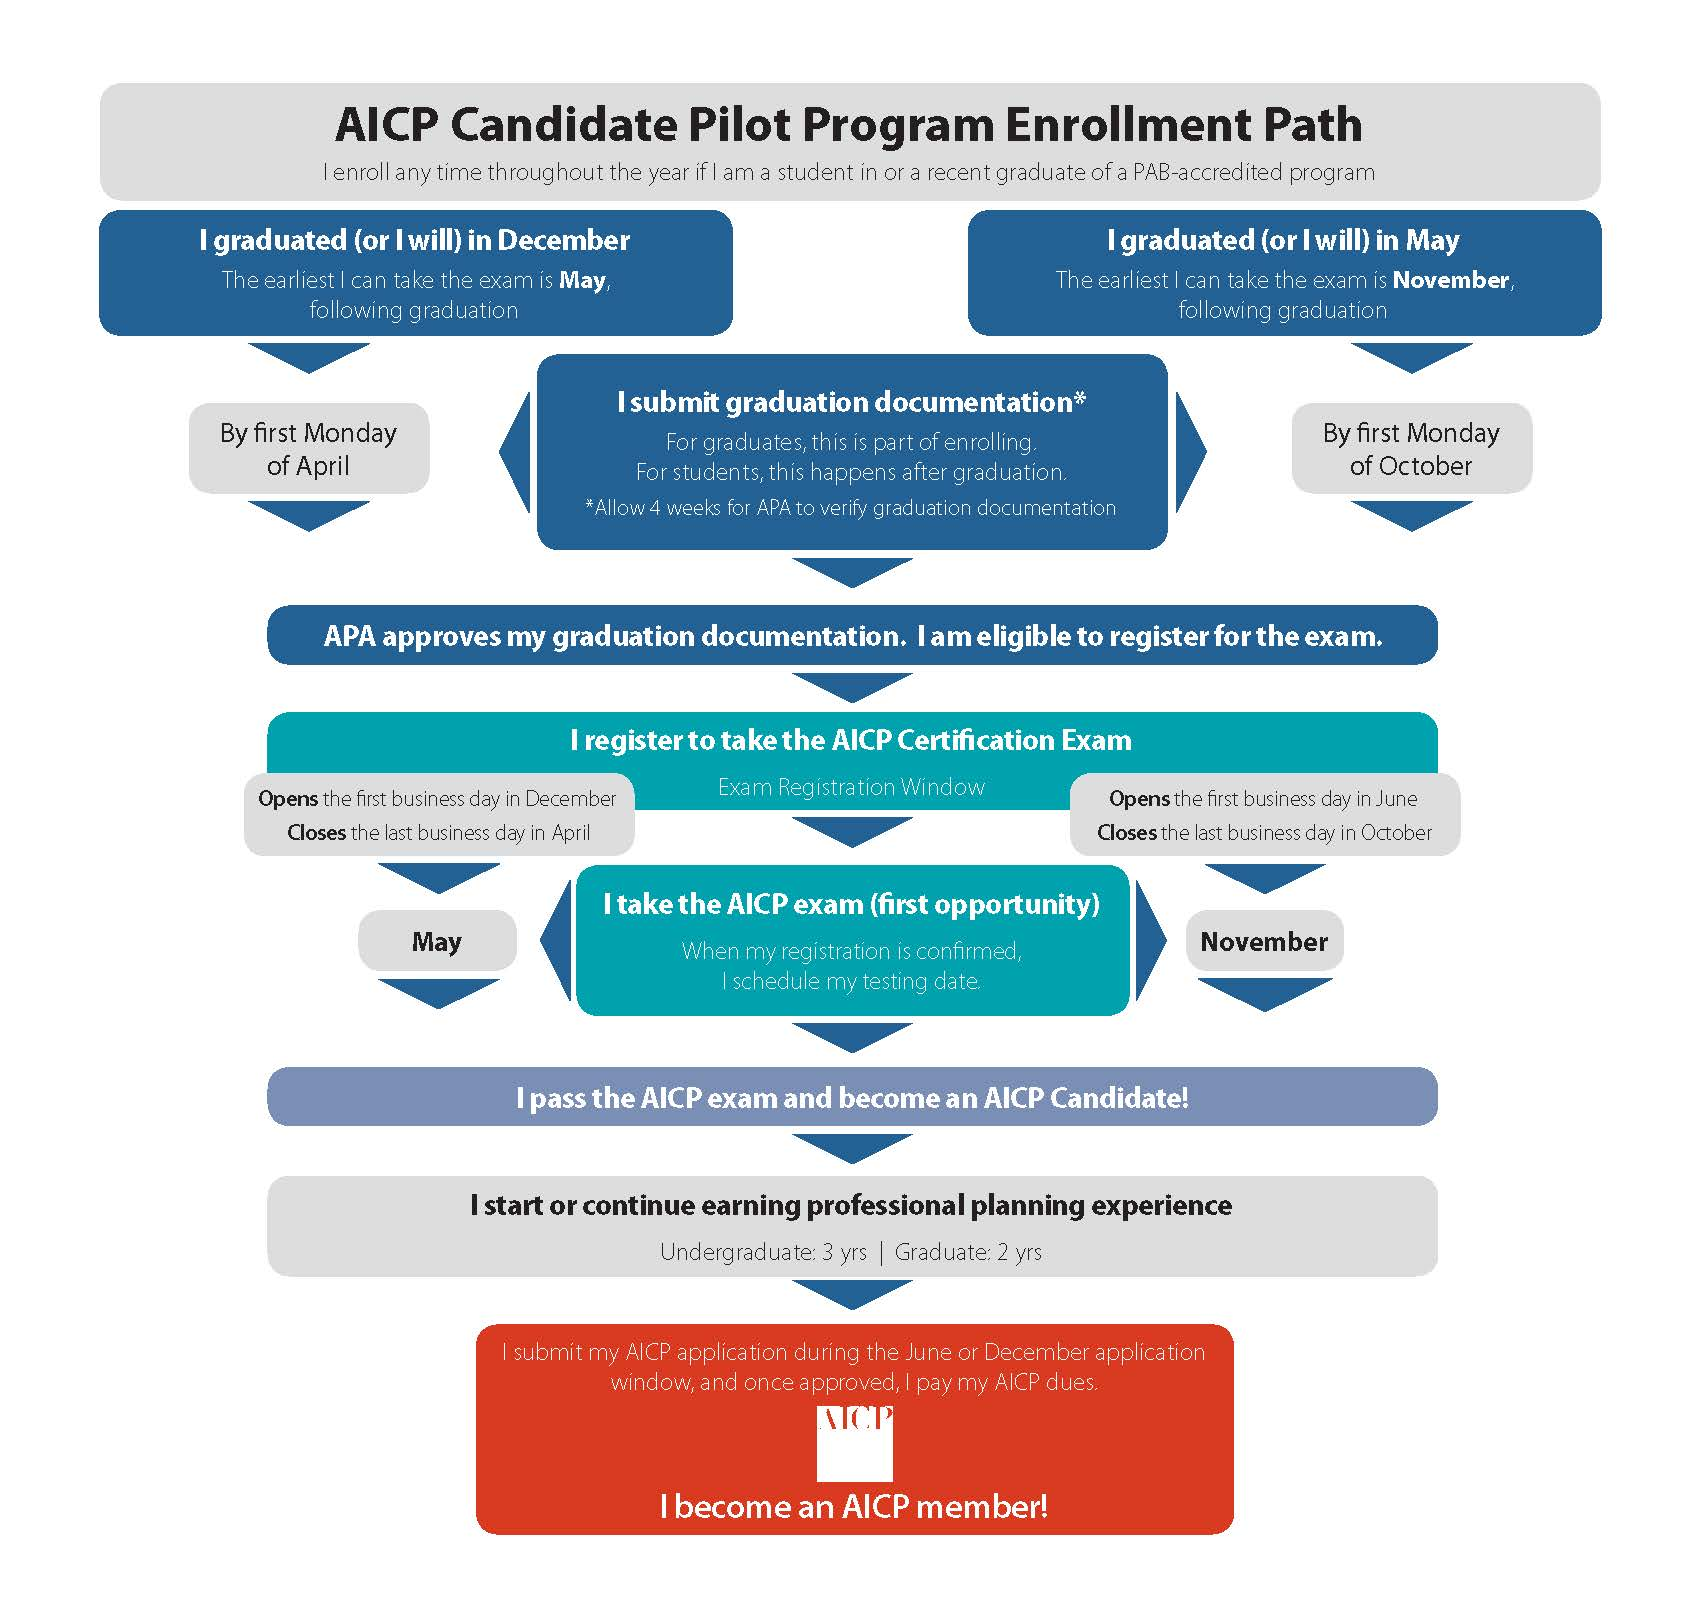 Aicp Candidate Pilot Program